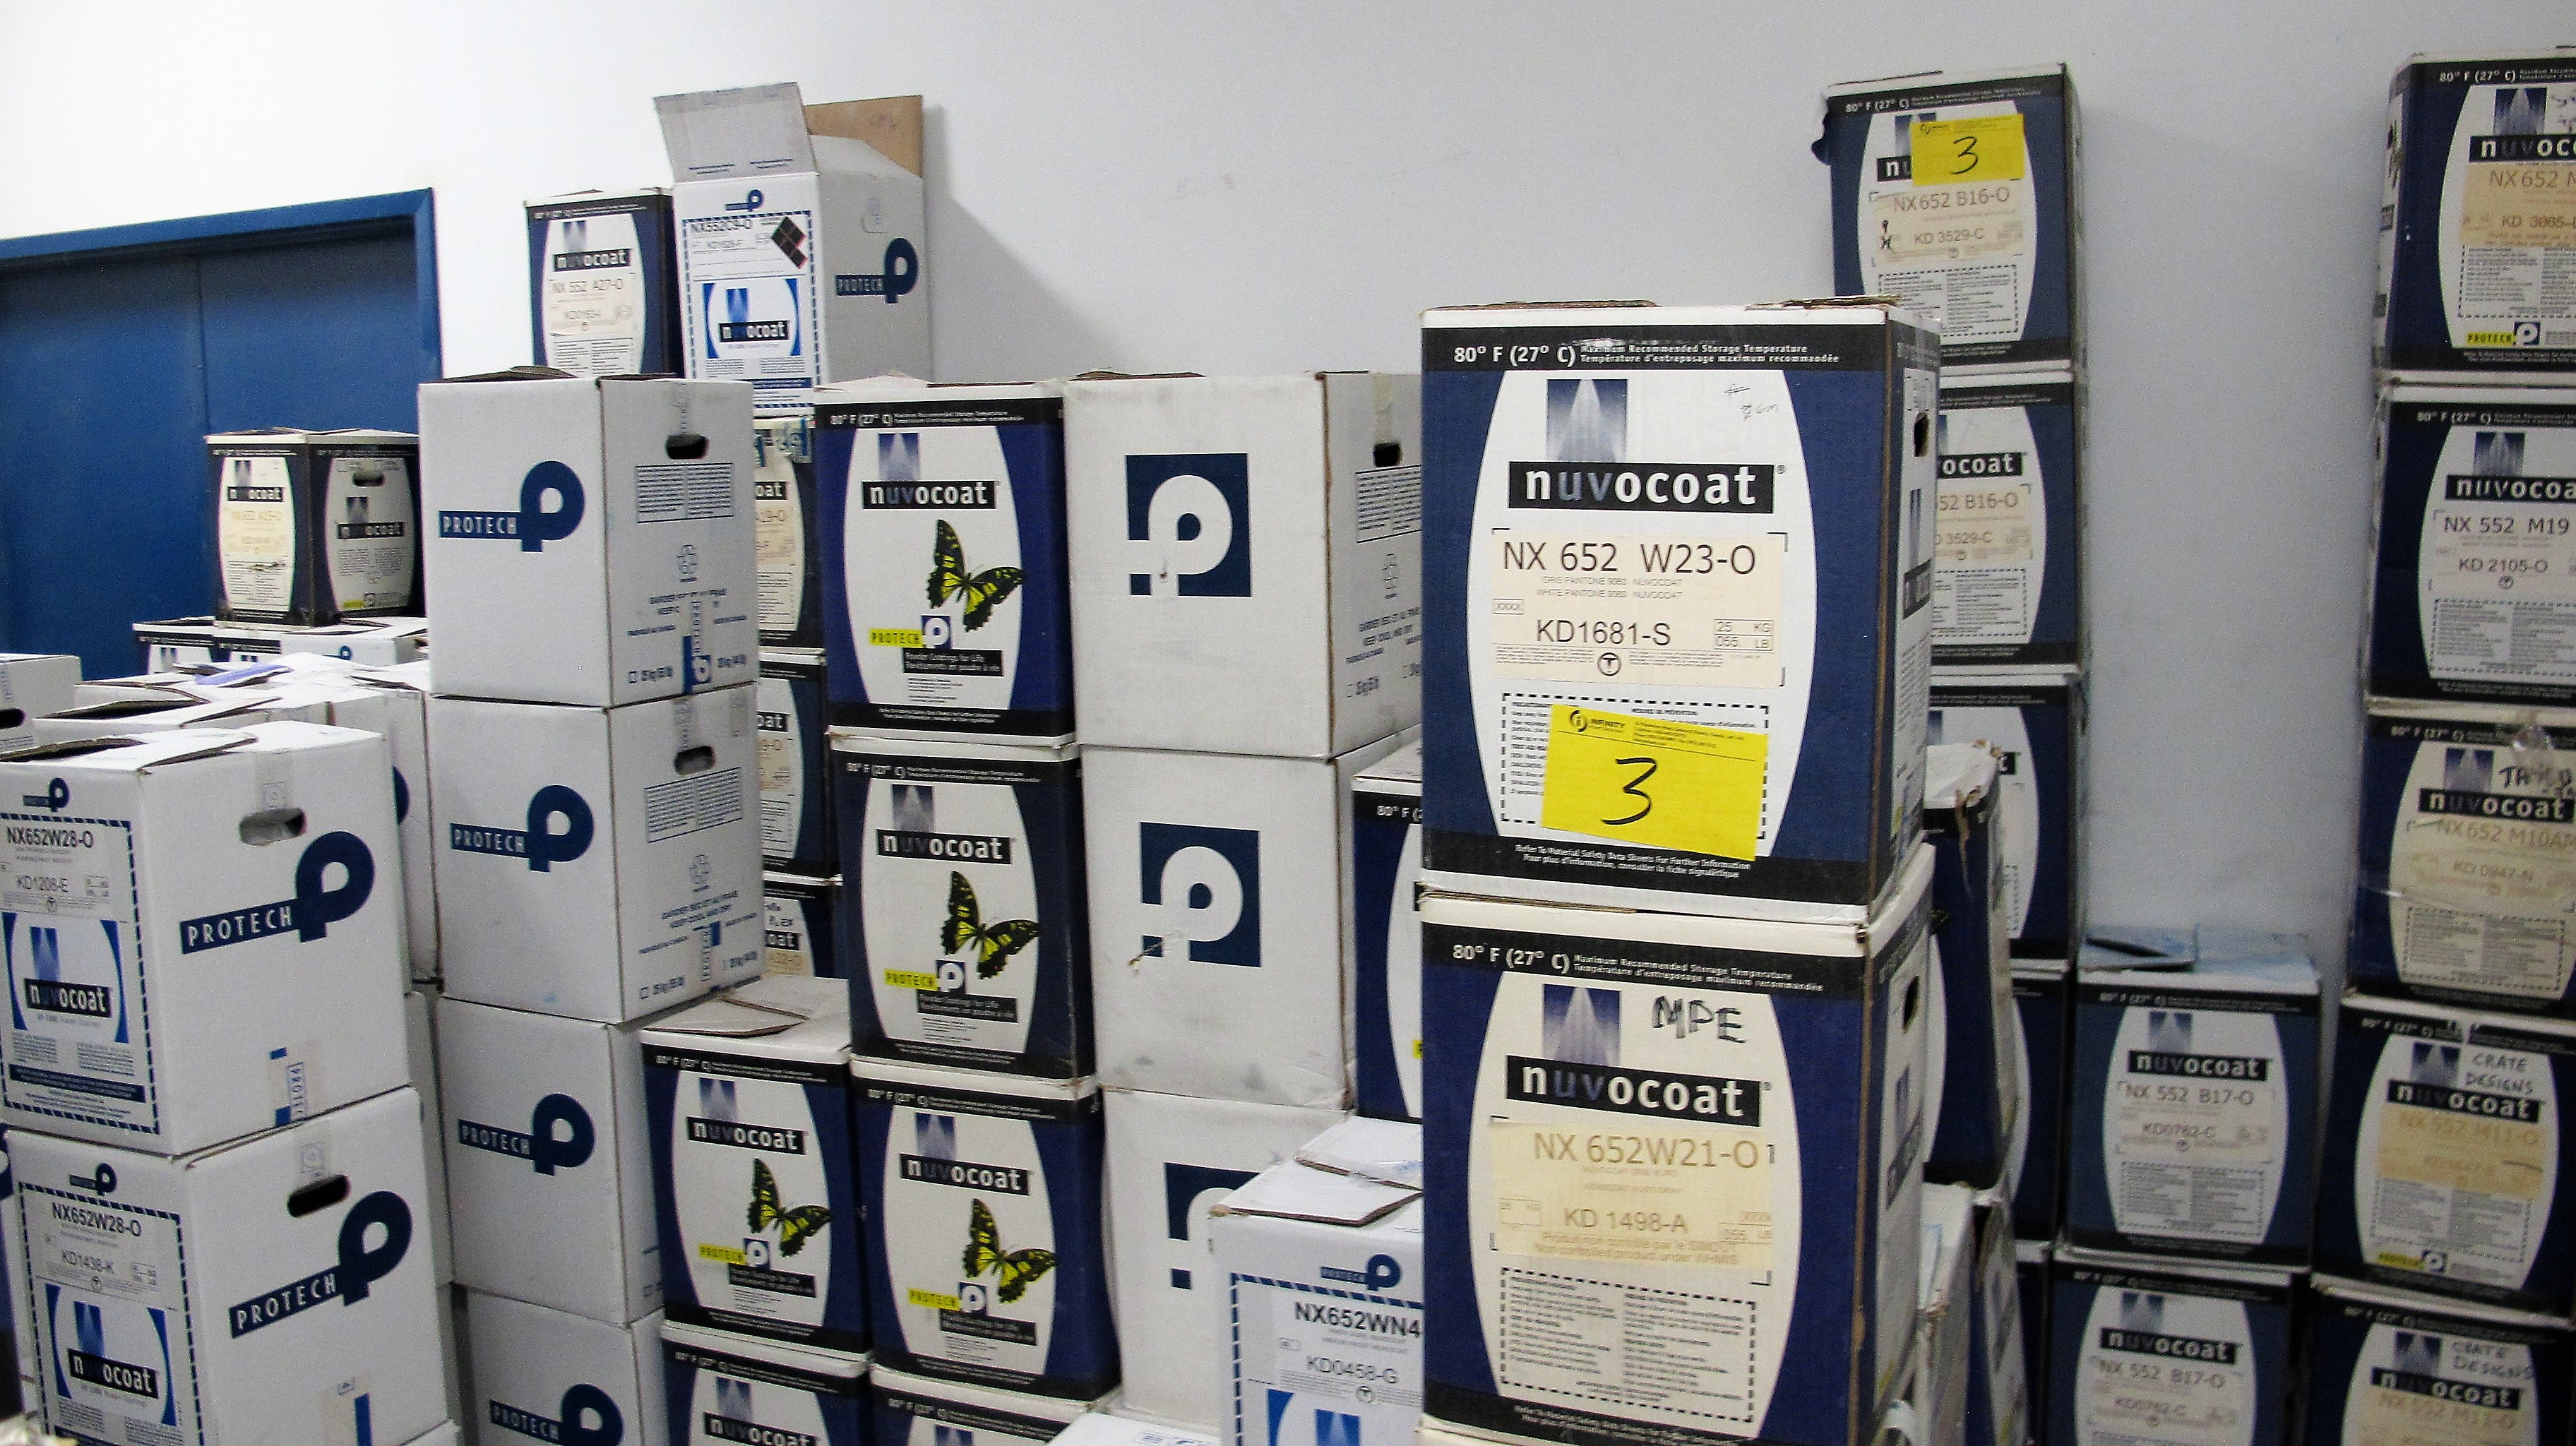 Lot 3 - APPROX. (150) BOXES (3,500KG) OF ASST. POWDER COATING PAINT (NUVOCOAT, E-BOND, PROTECH, PRISM POWDER